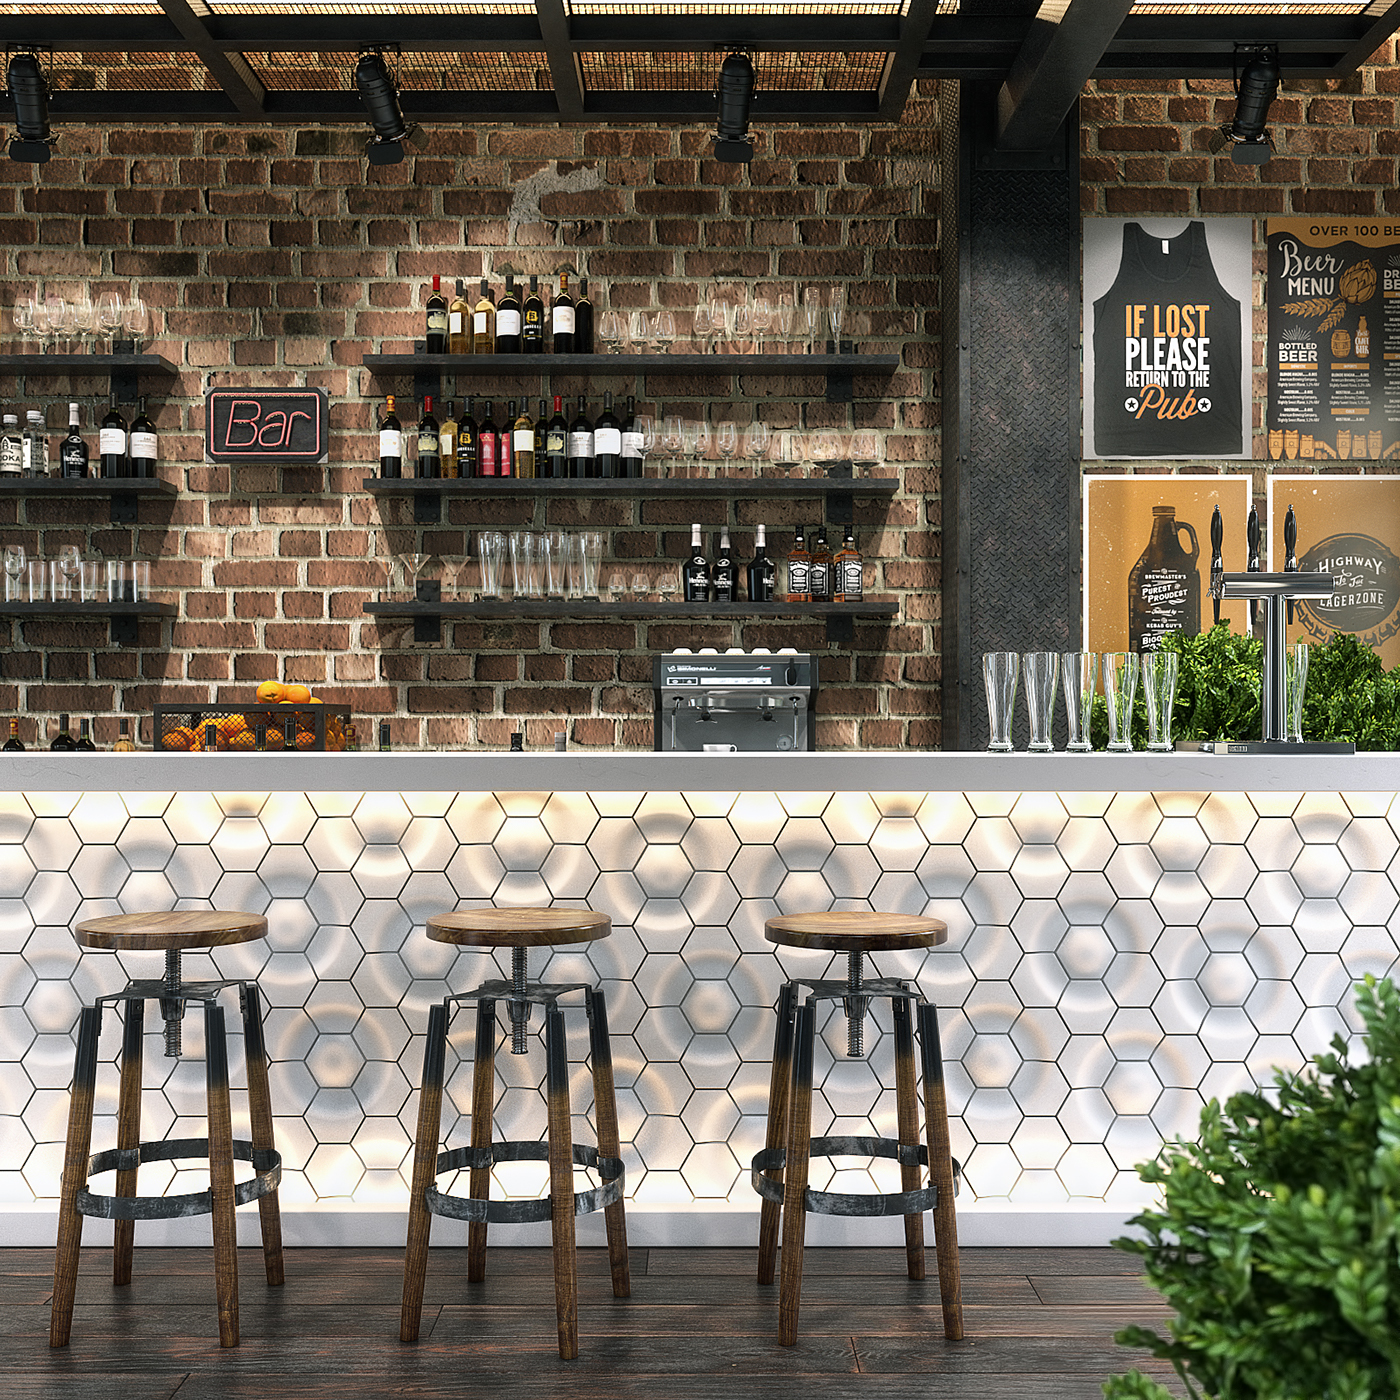 Bar counter 3d model on behance for Food bar 3d model